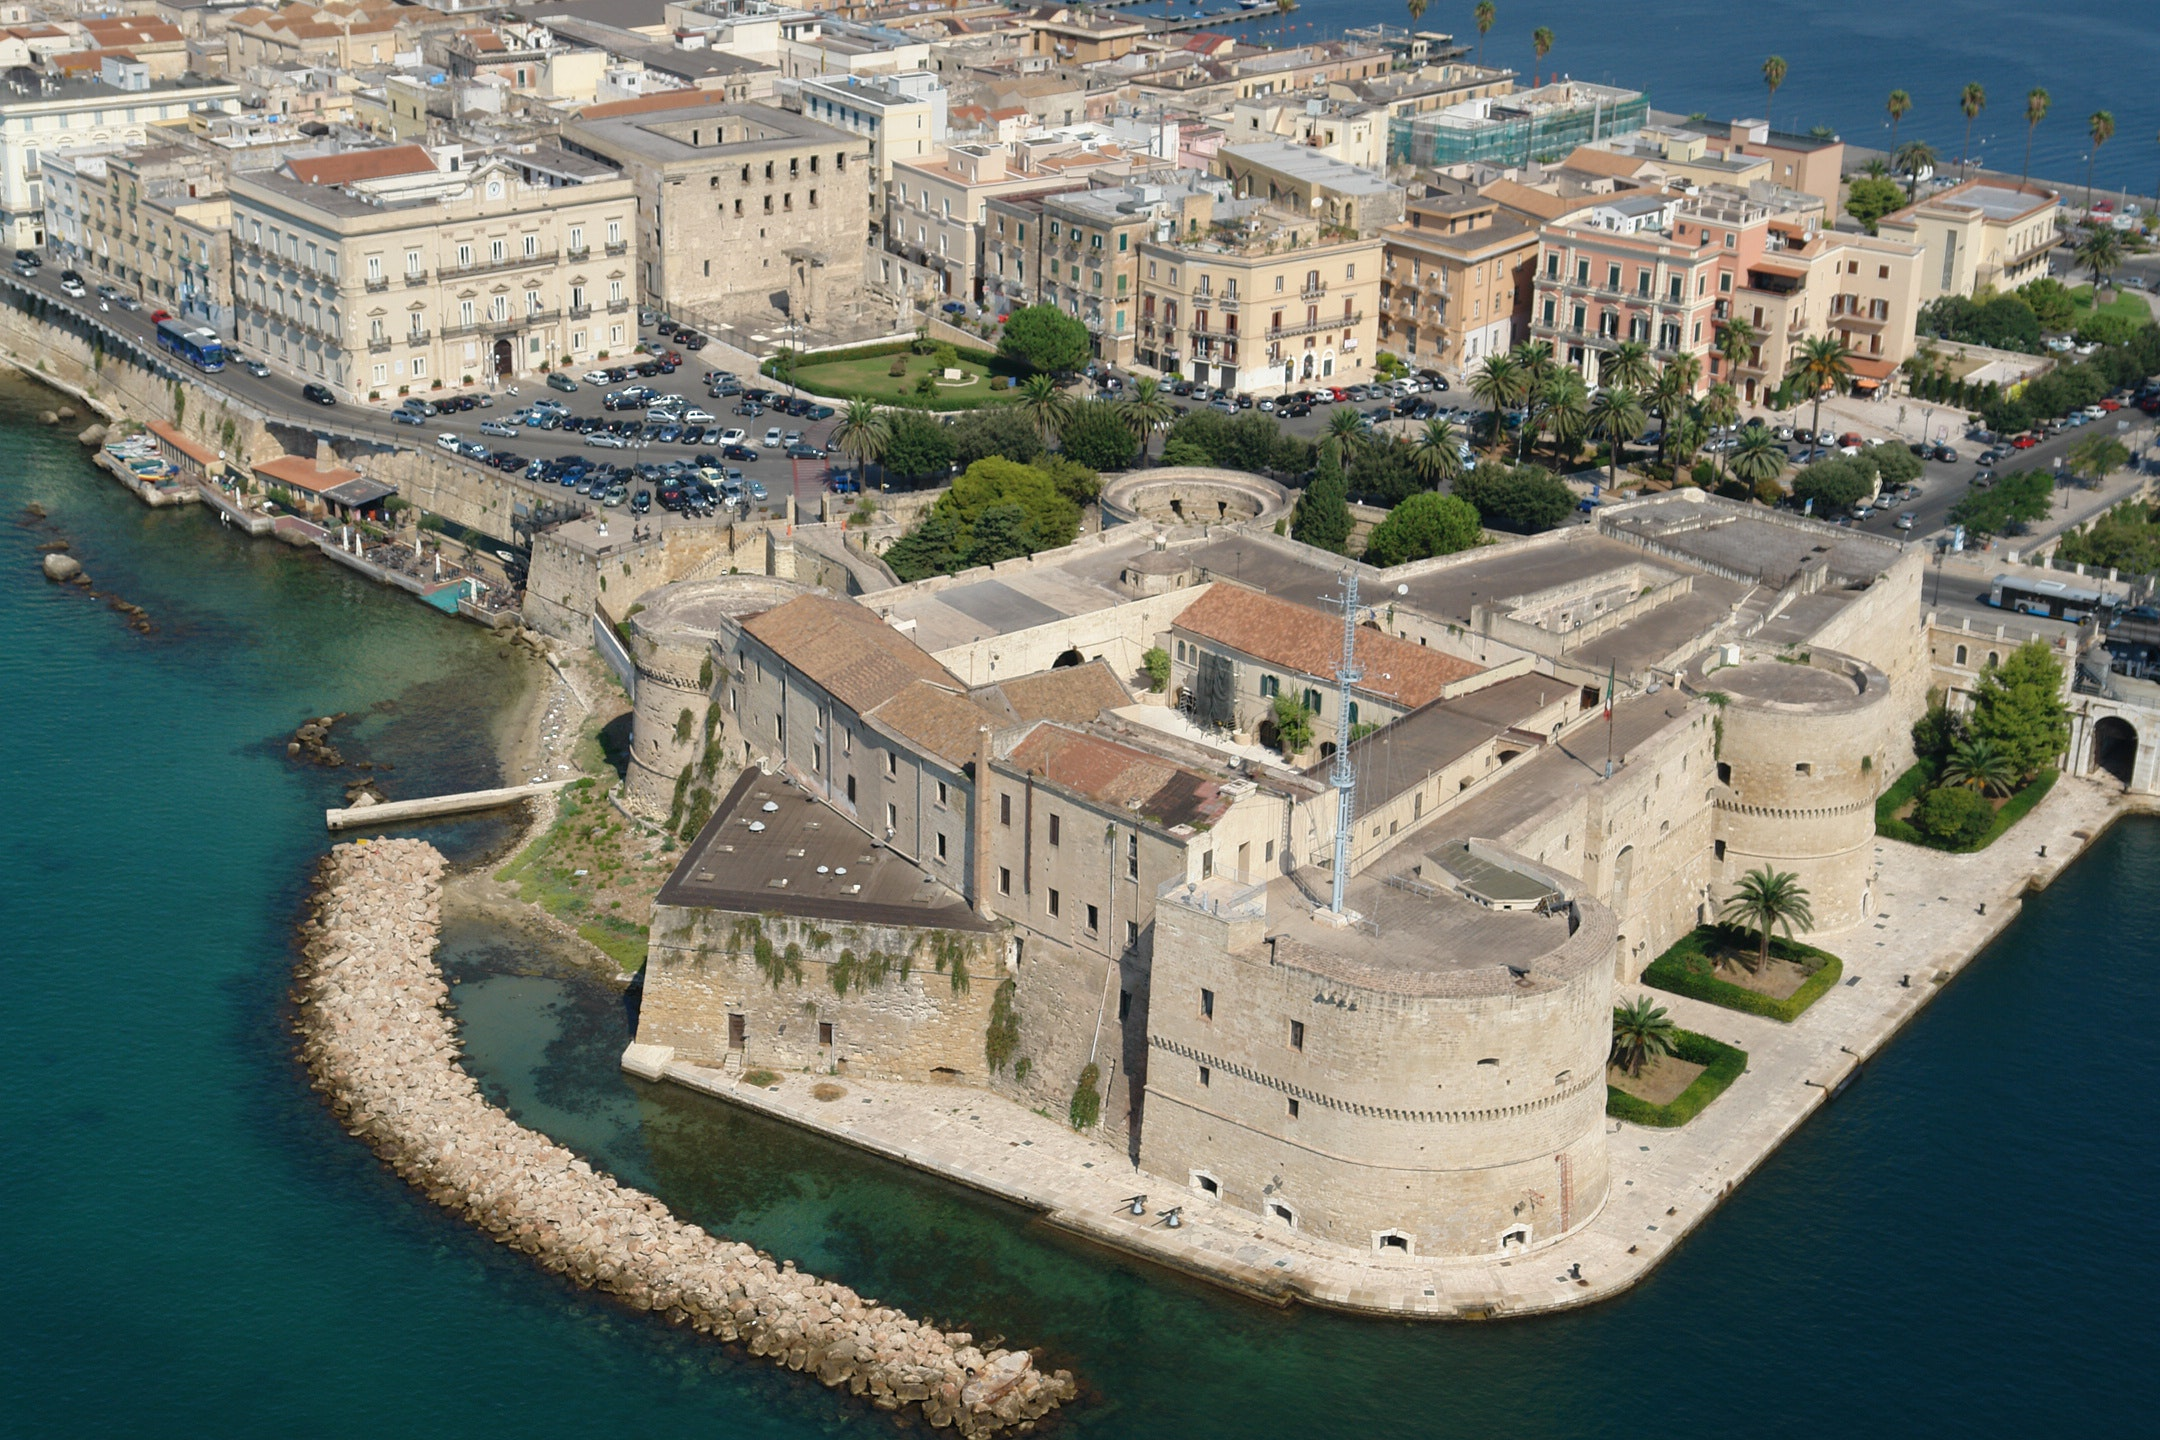 Castello Aragonese, CASTELLO ARAGONESE, TARANTO (TA )